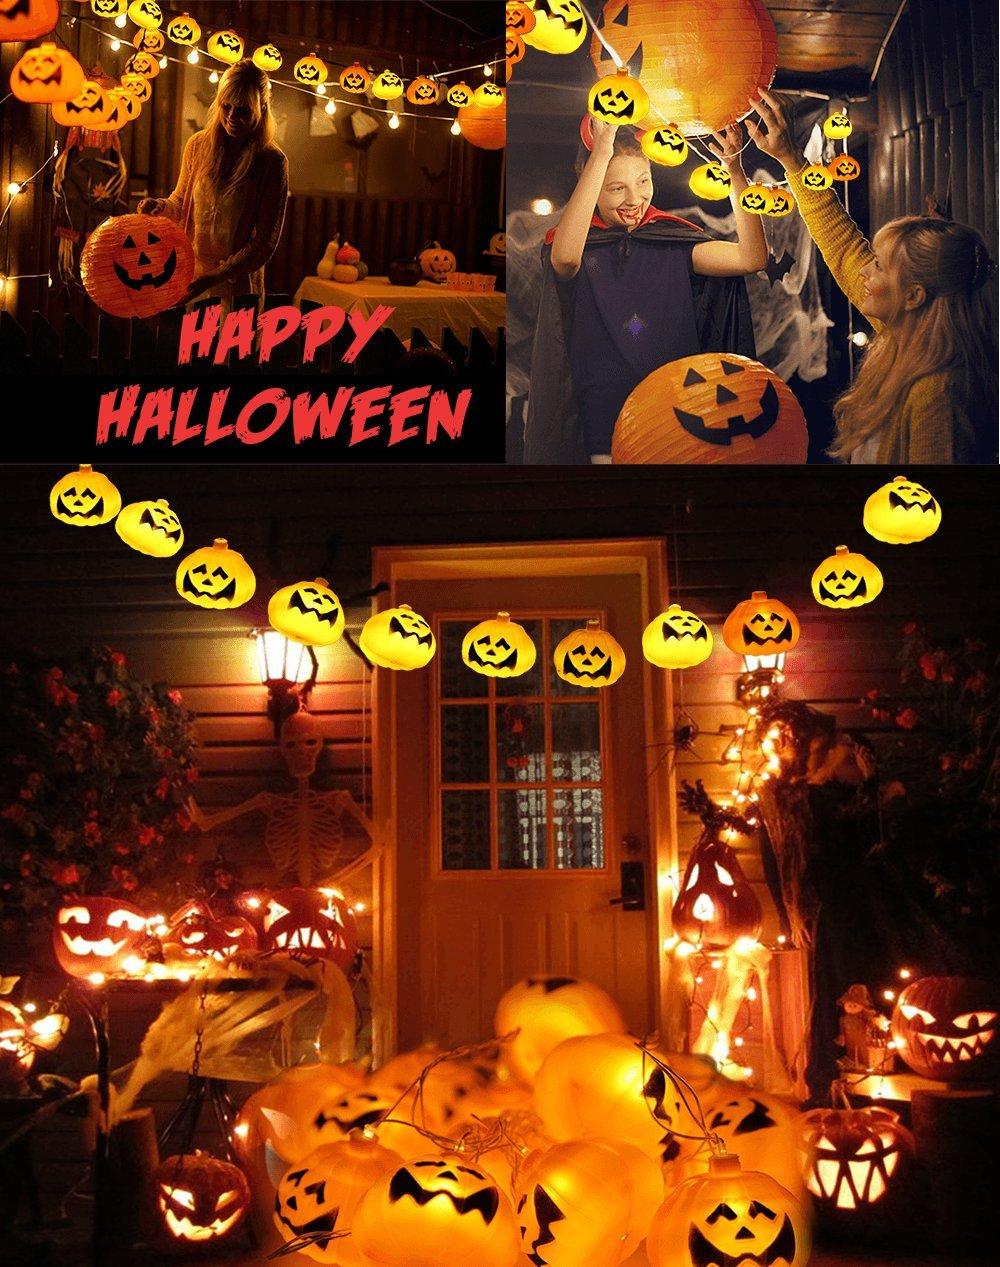 GiBot Halloween Pumpkin Lights Lanterns Orange JX0042 20 LED 6.9 feet Battery Powered Pumpkin String Lights 3D Jack o Lantern Halloween Pumpkin Lights Decor for Indoor Outdoor Party Ideas